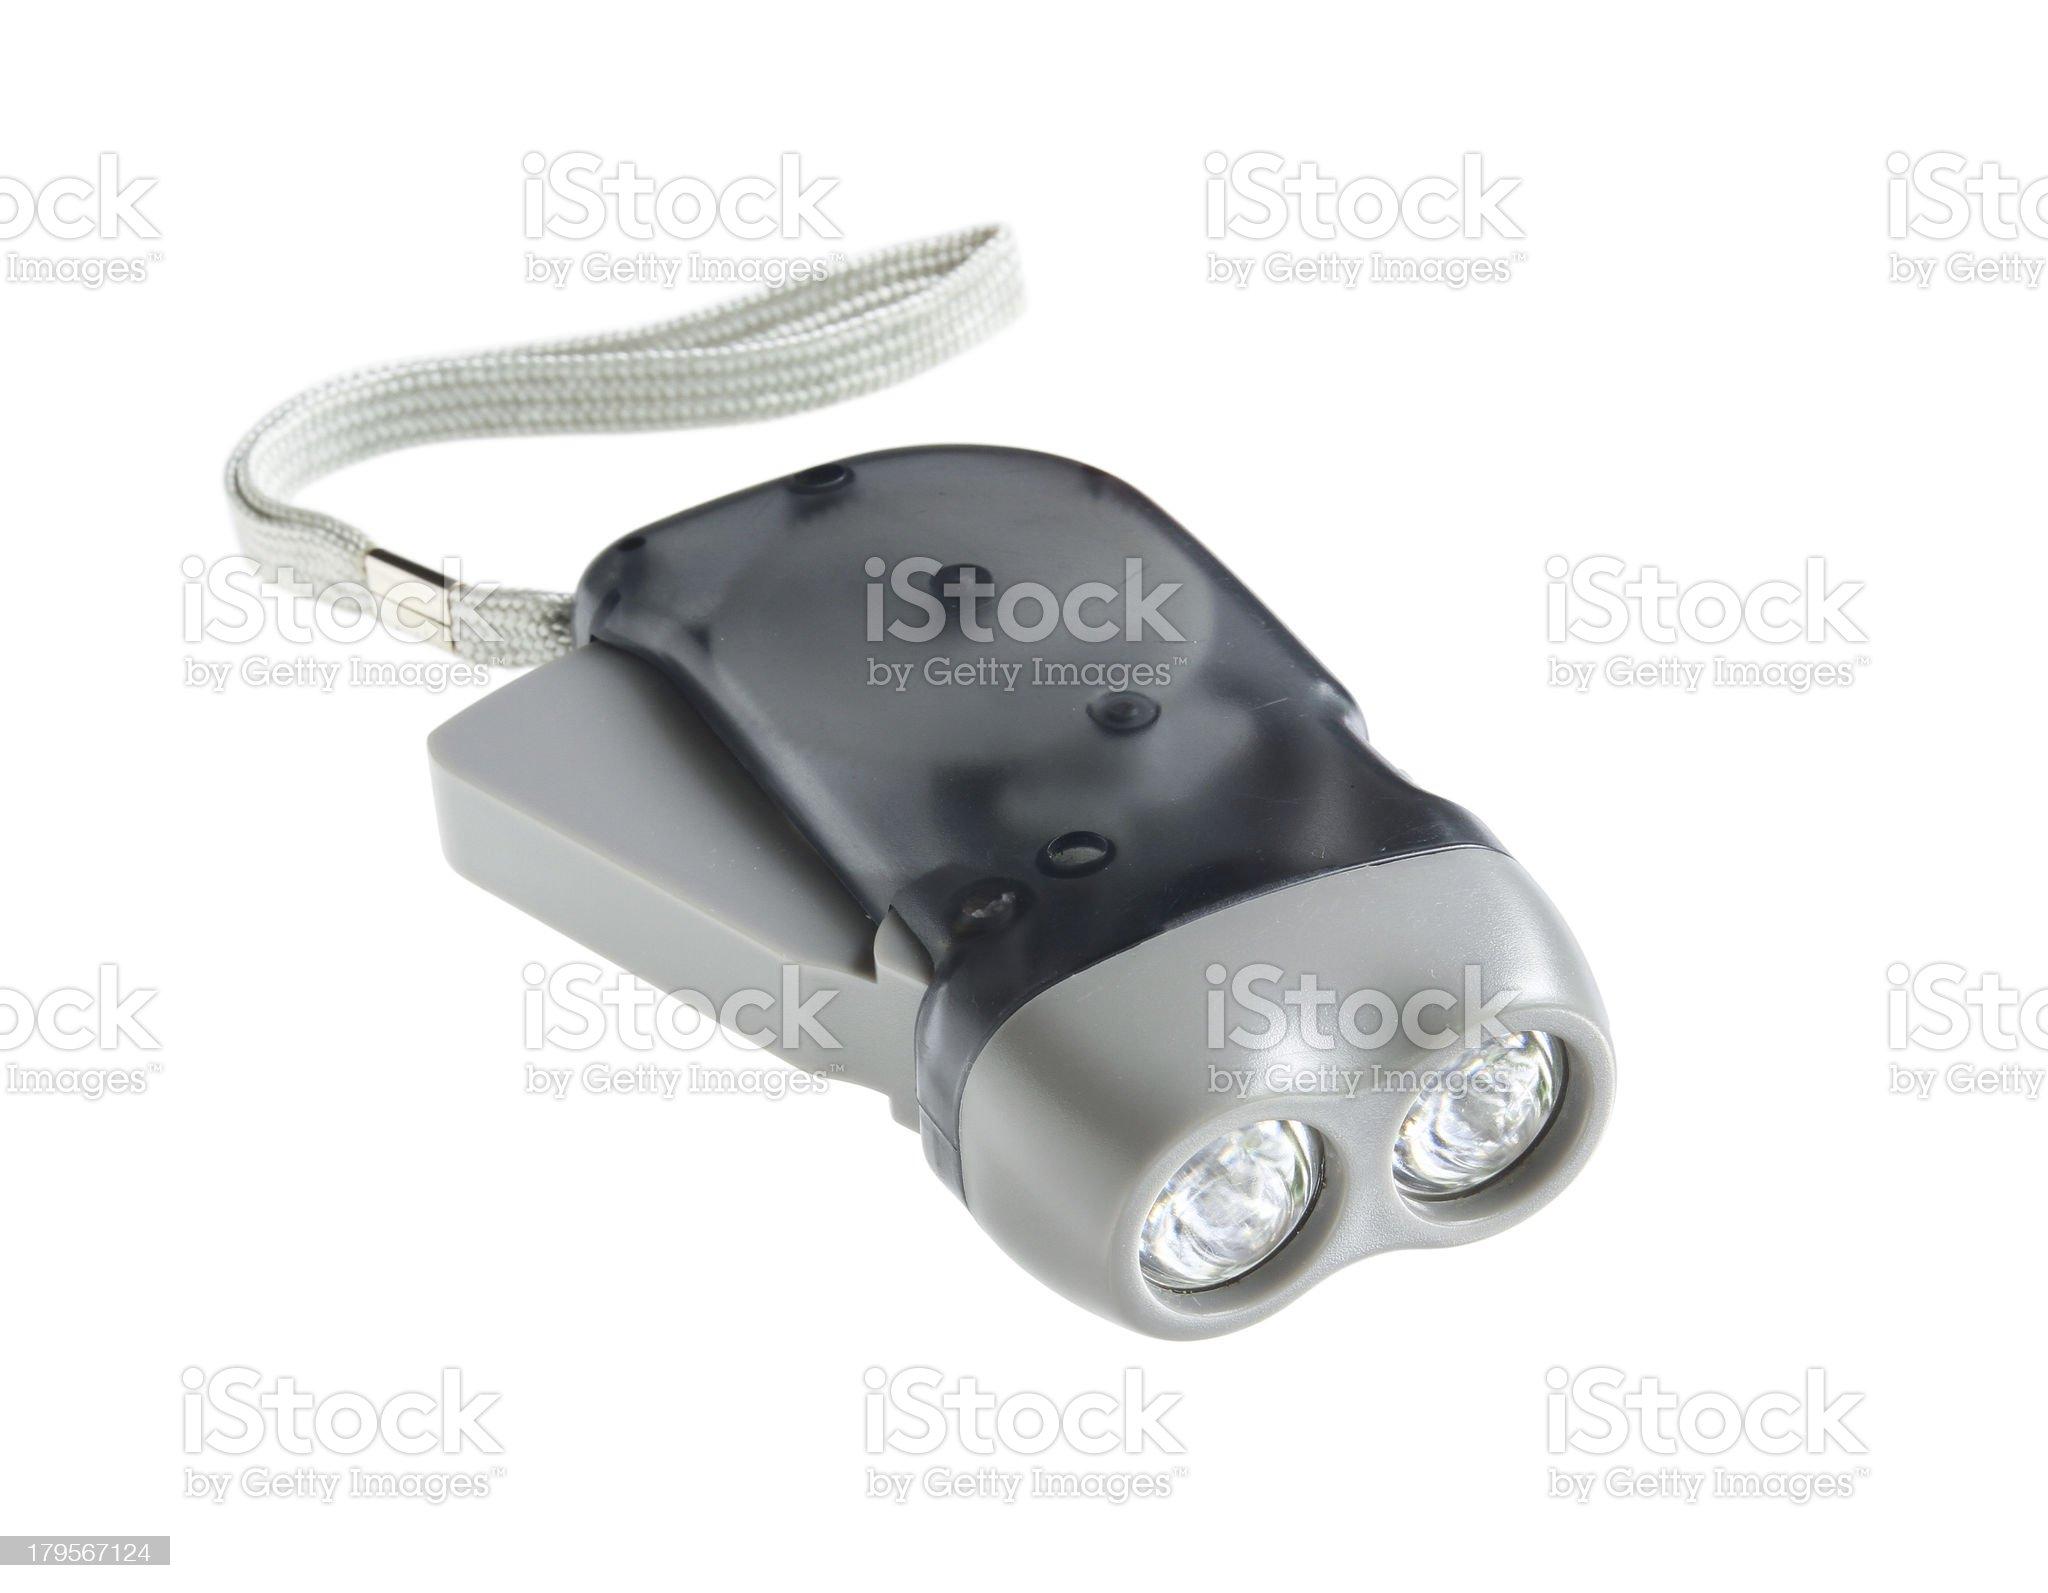 Eco Torch (hand crank press powered dynamo LED flashlight) royalty-free stock photo